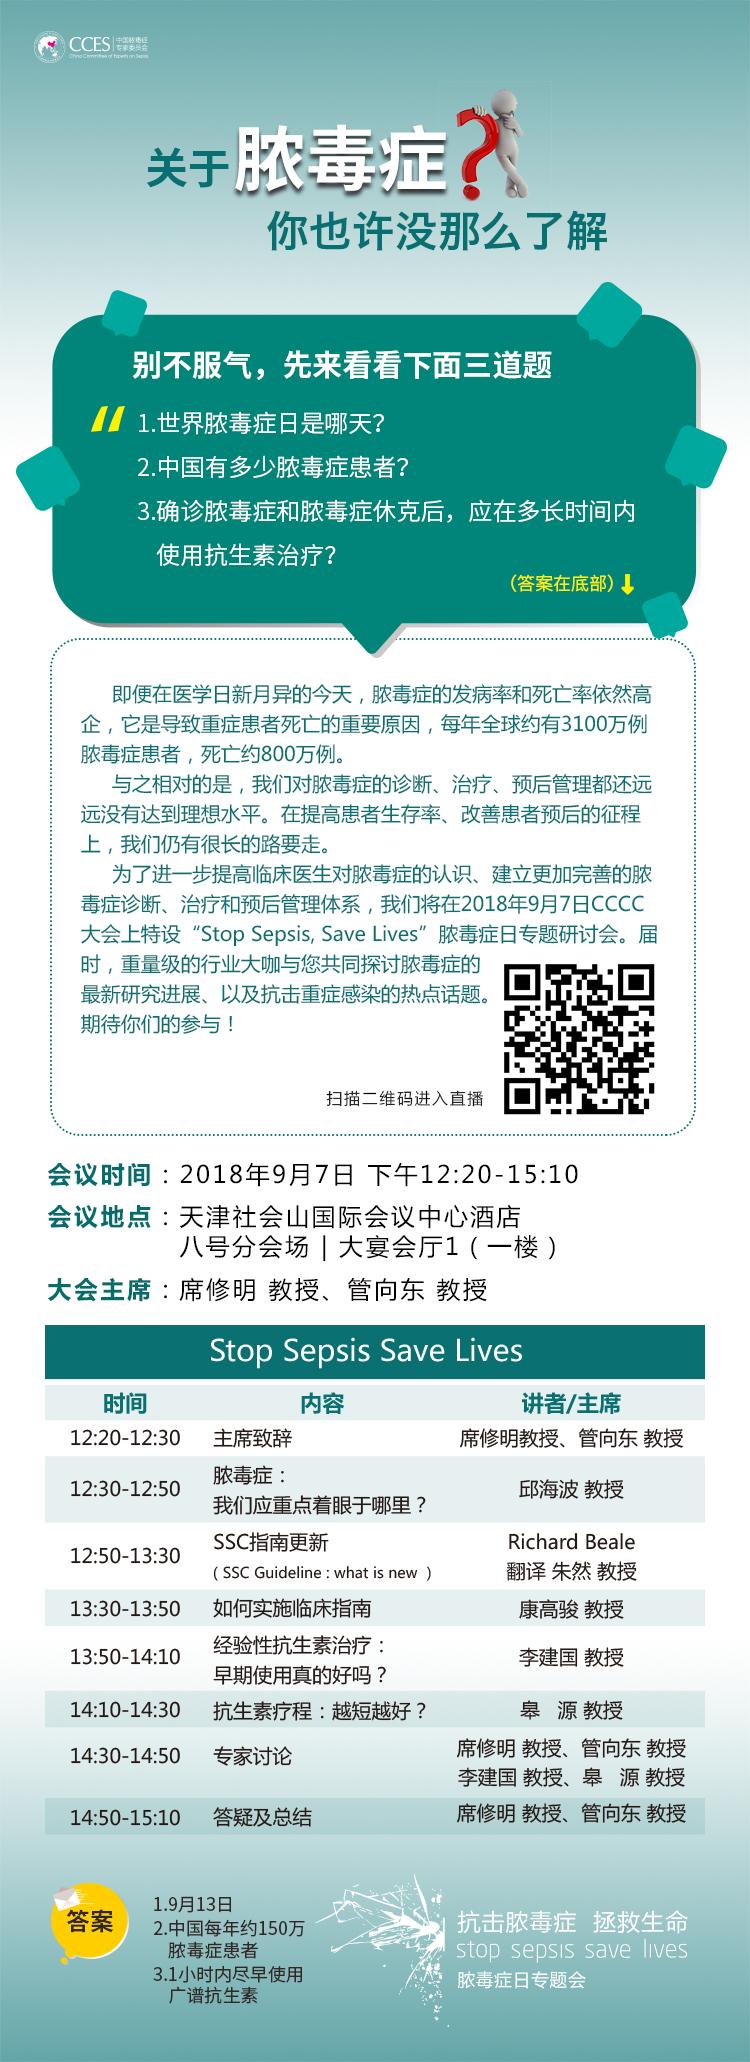 [CCCC 2018]: 世界脓毒症日专题